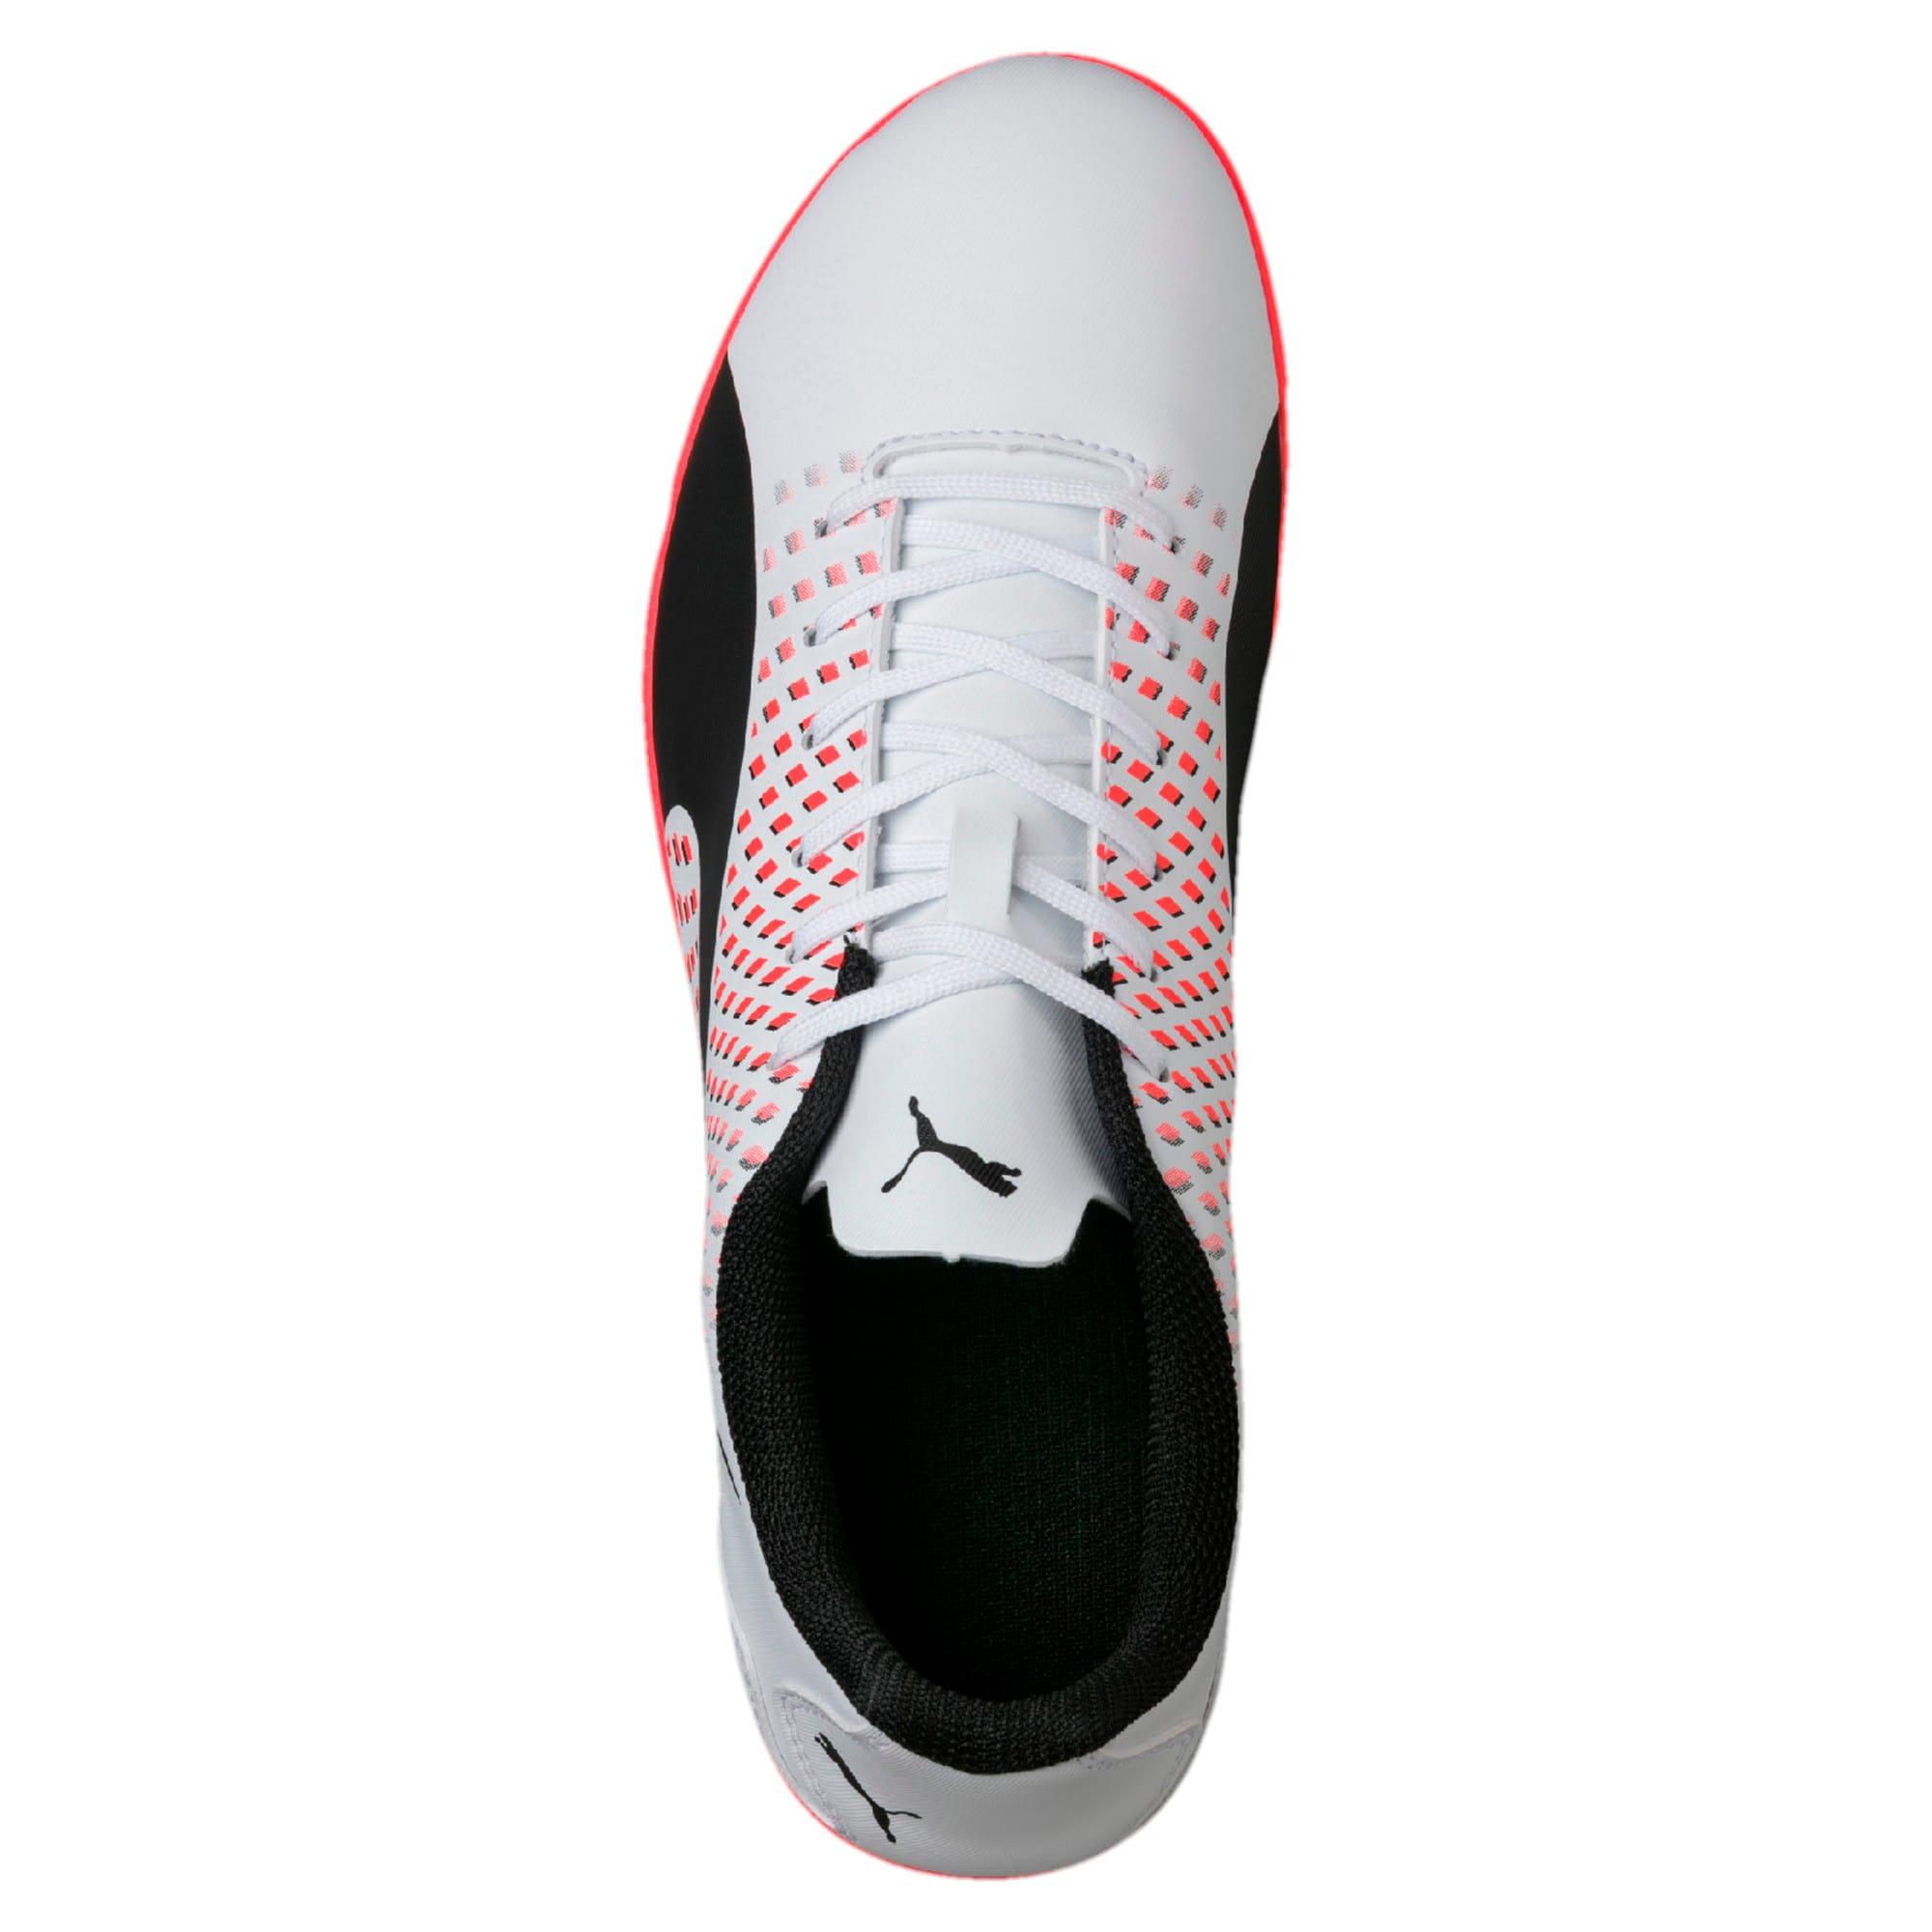 Thumbnail 4 of Adreno III TT Men's Football Boots, White-Black-Coral, medium-IND